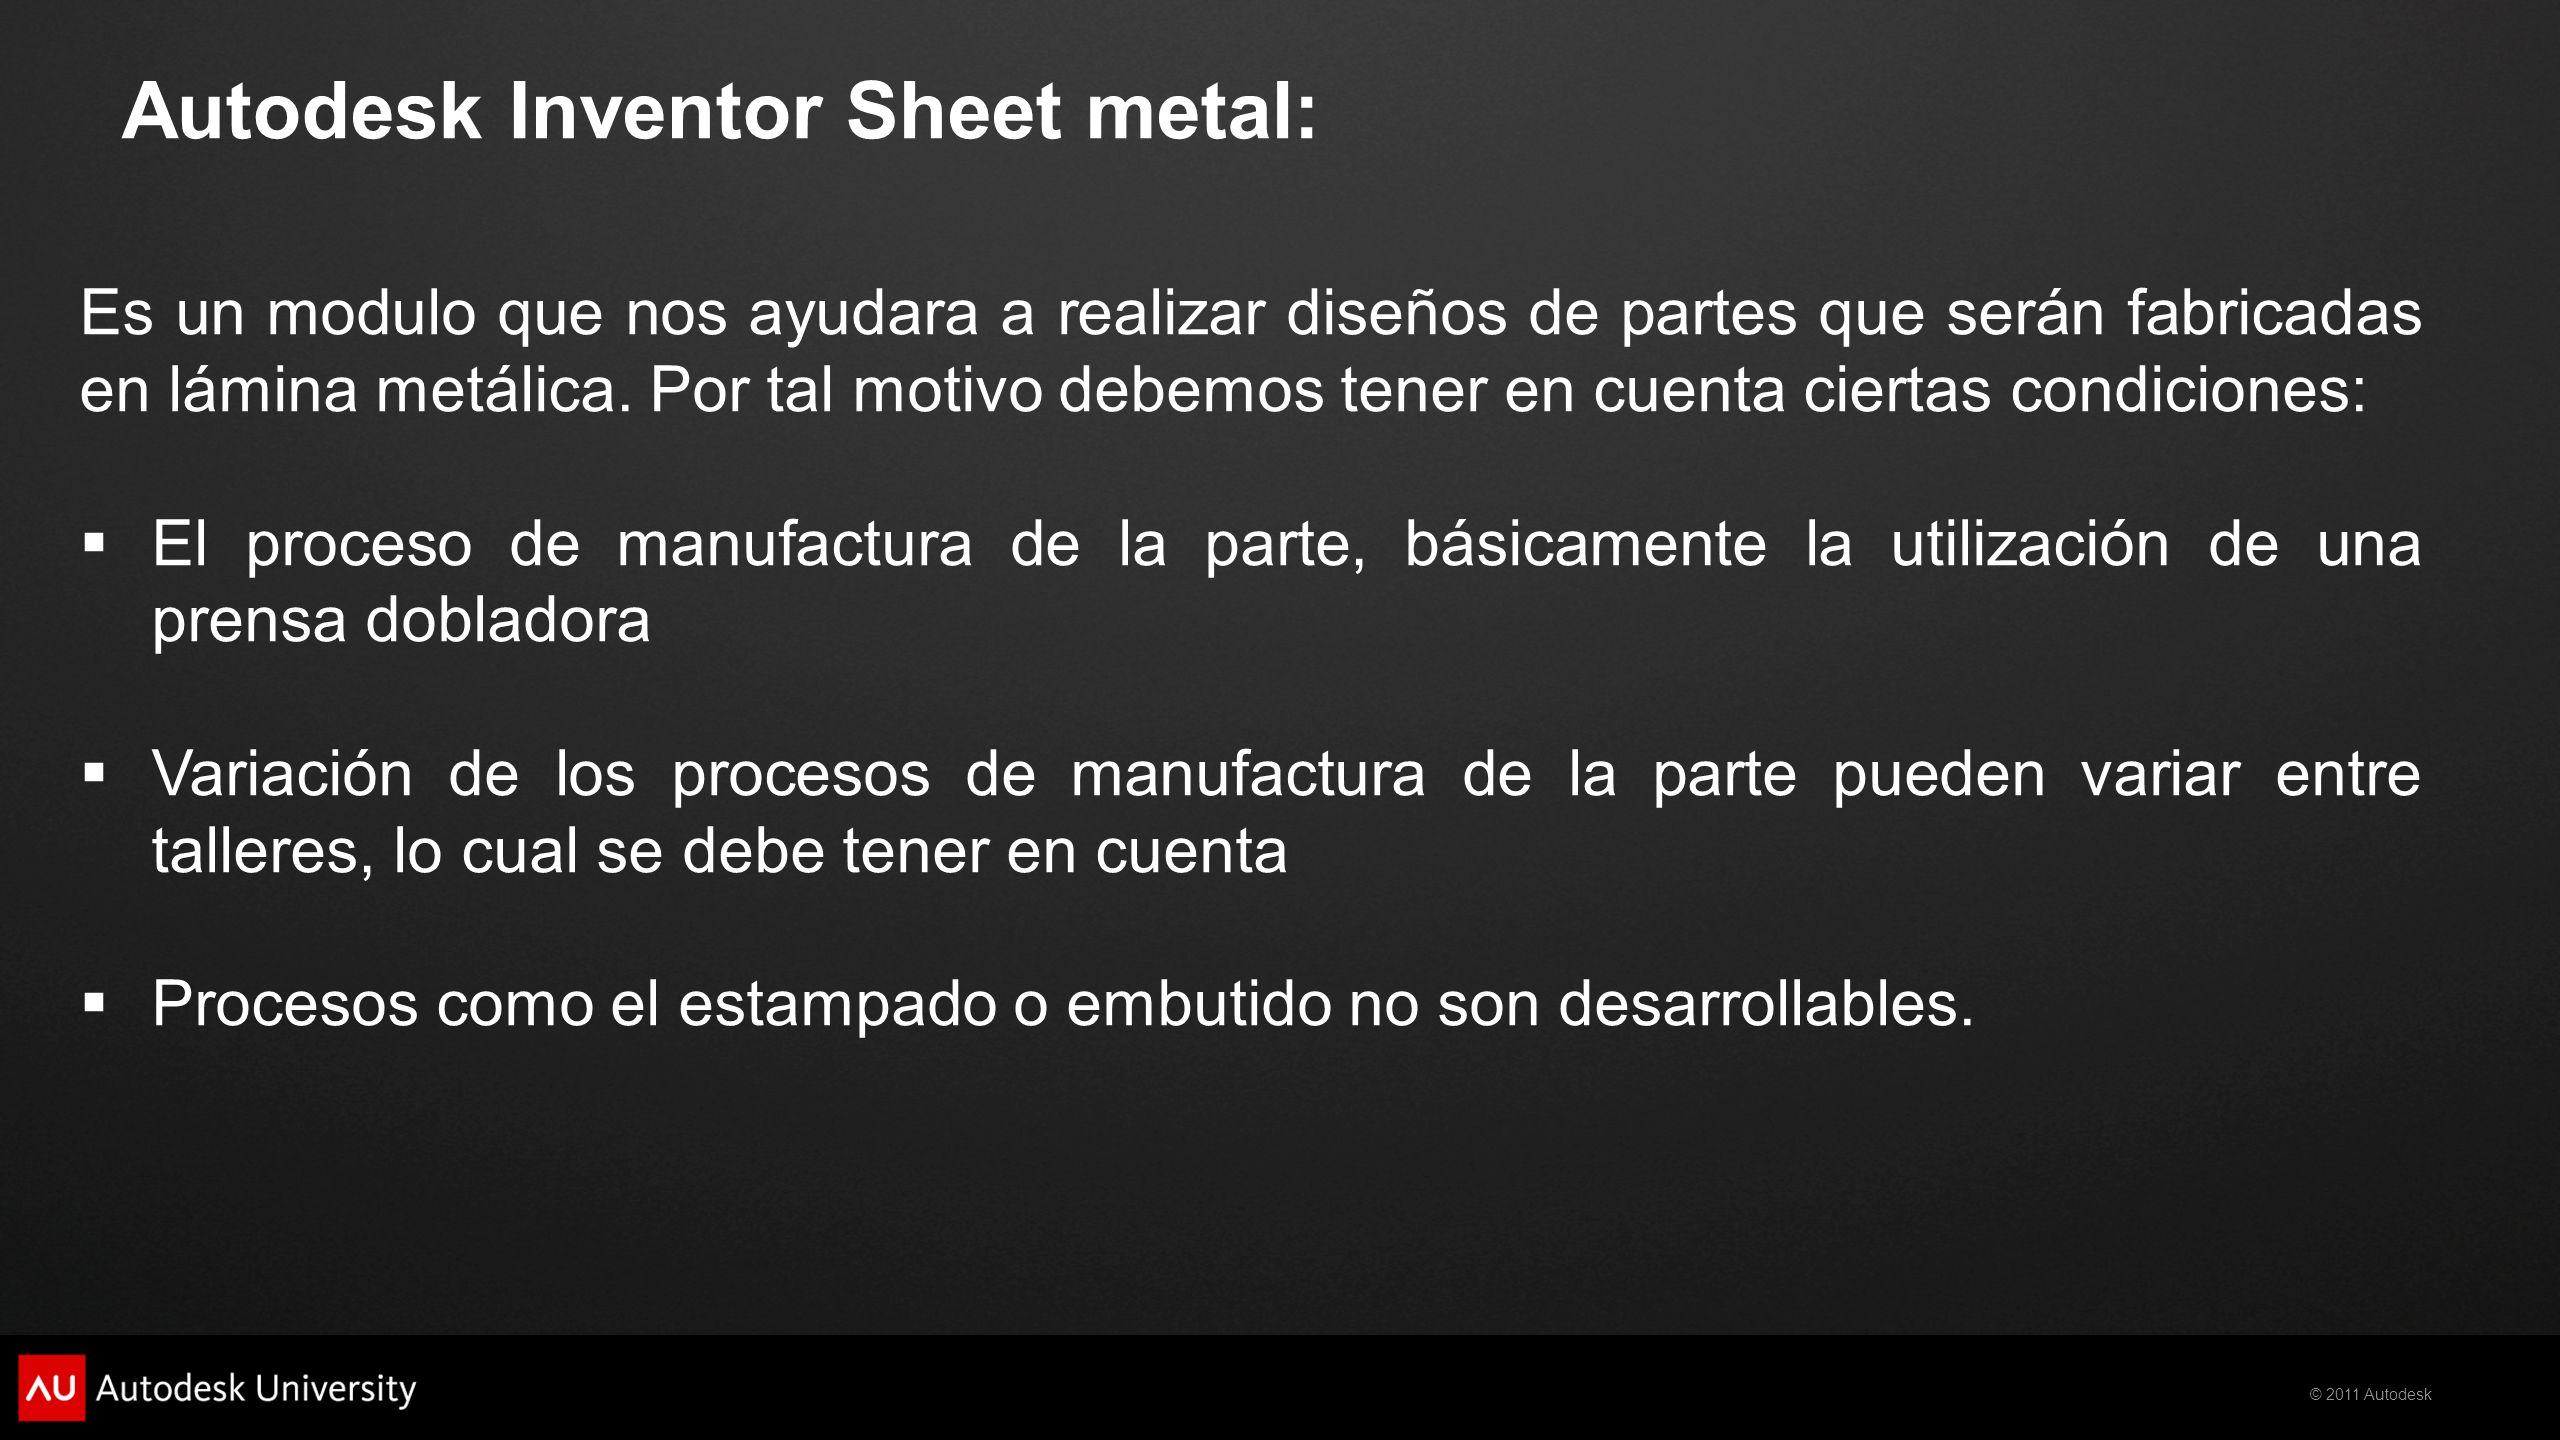 Autodesk Inventor Sheet metal: